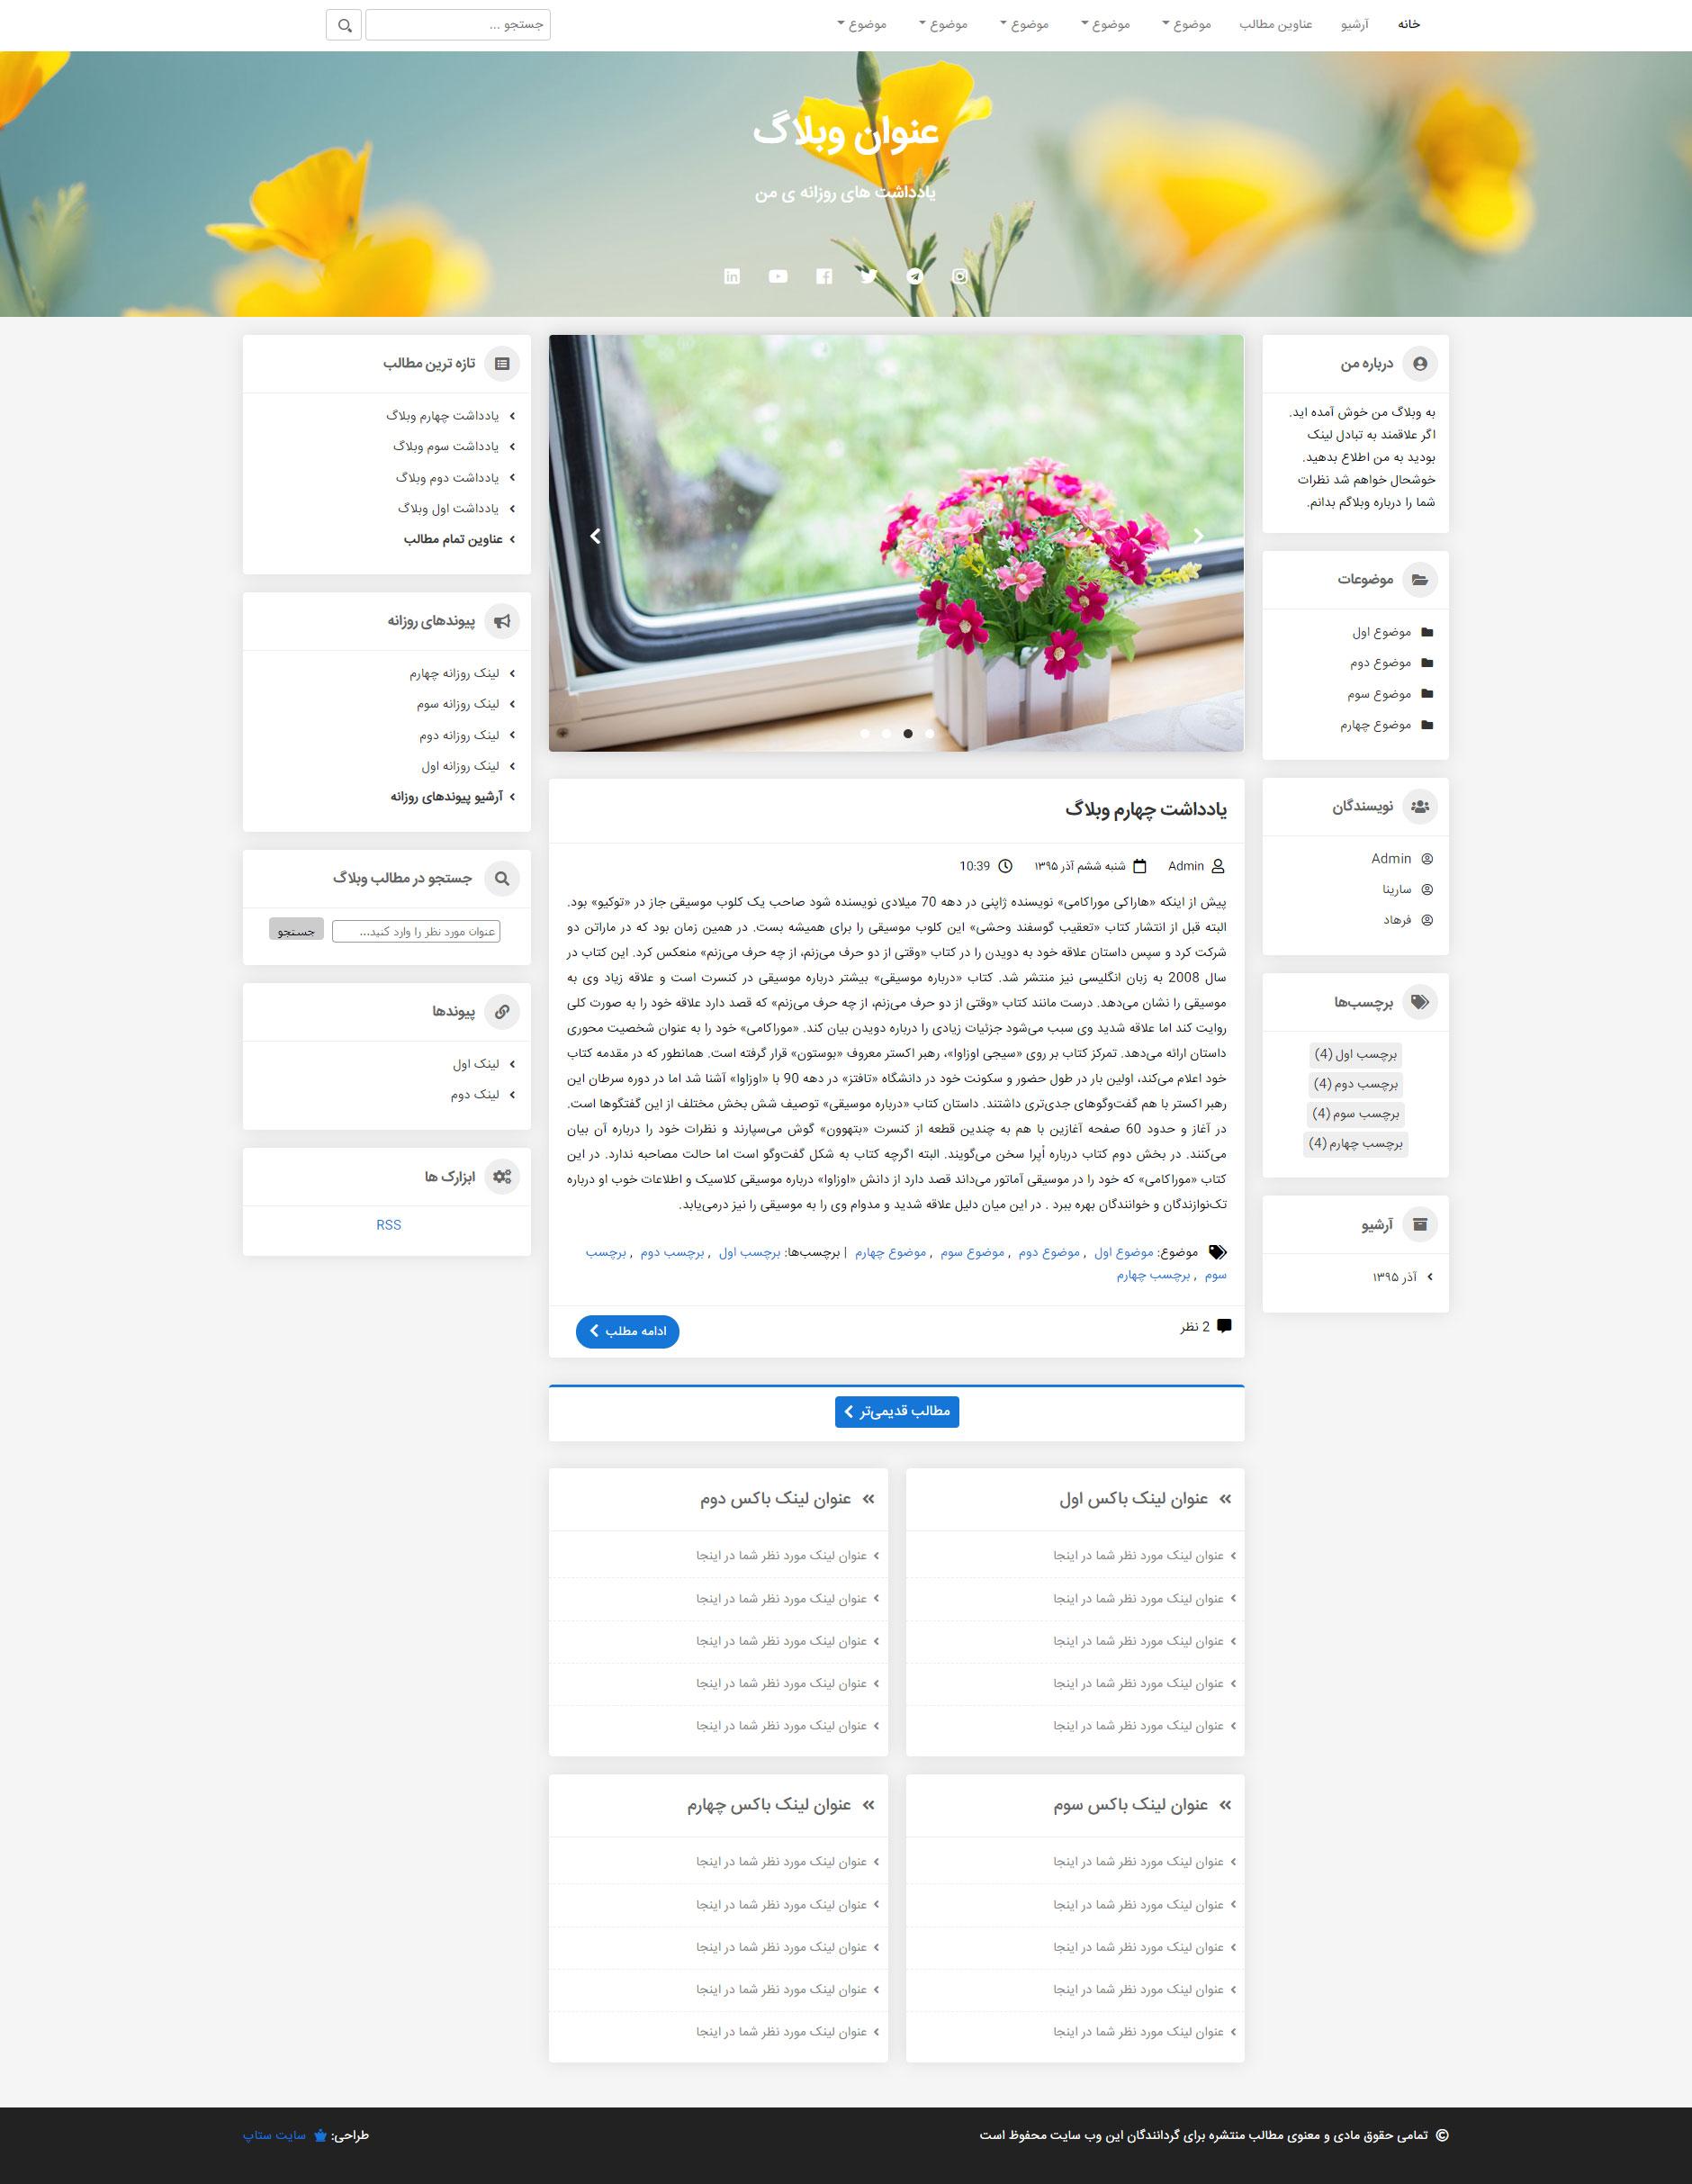 قالب سه ستونه وبلاگ